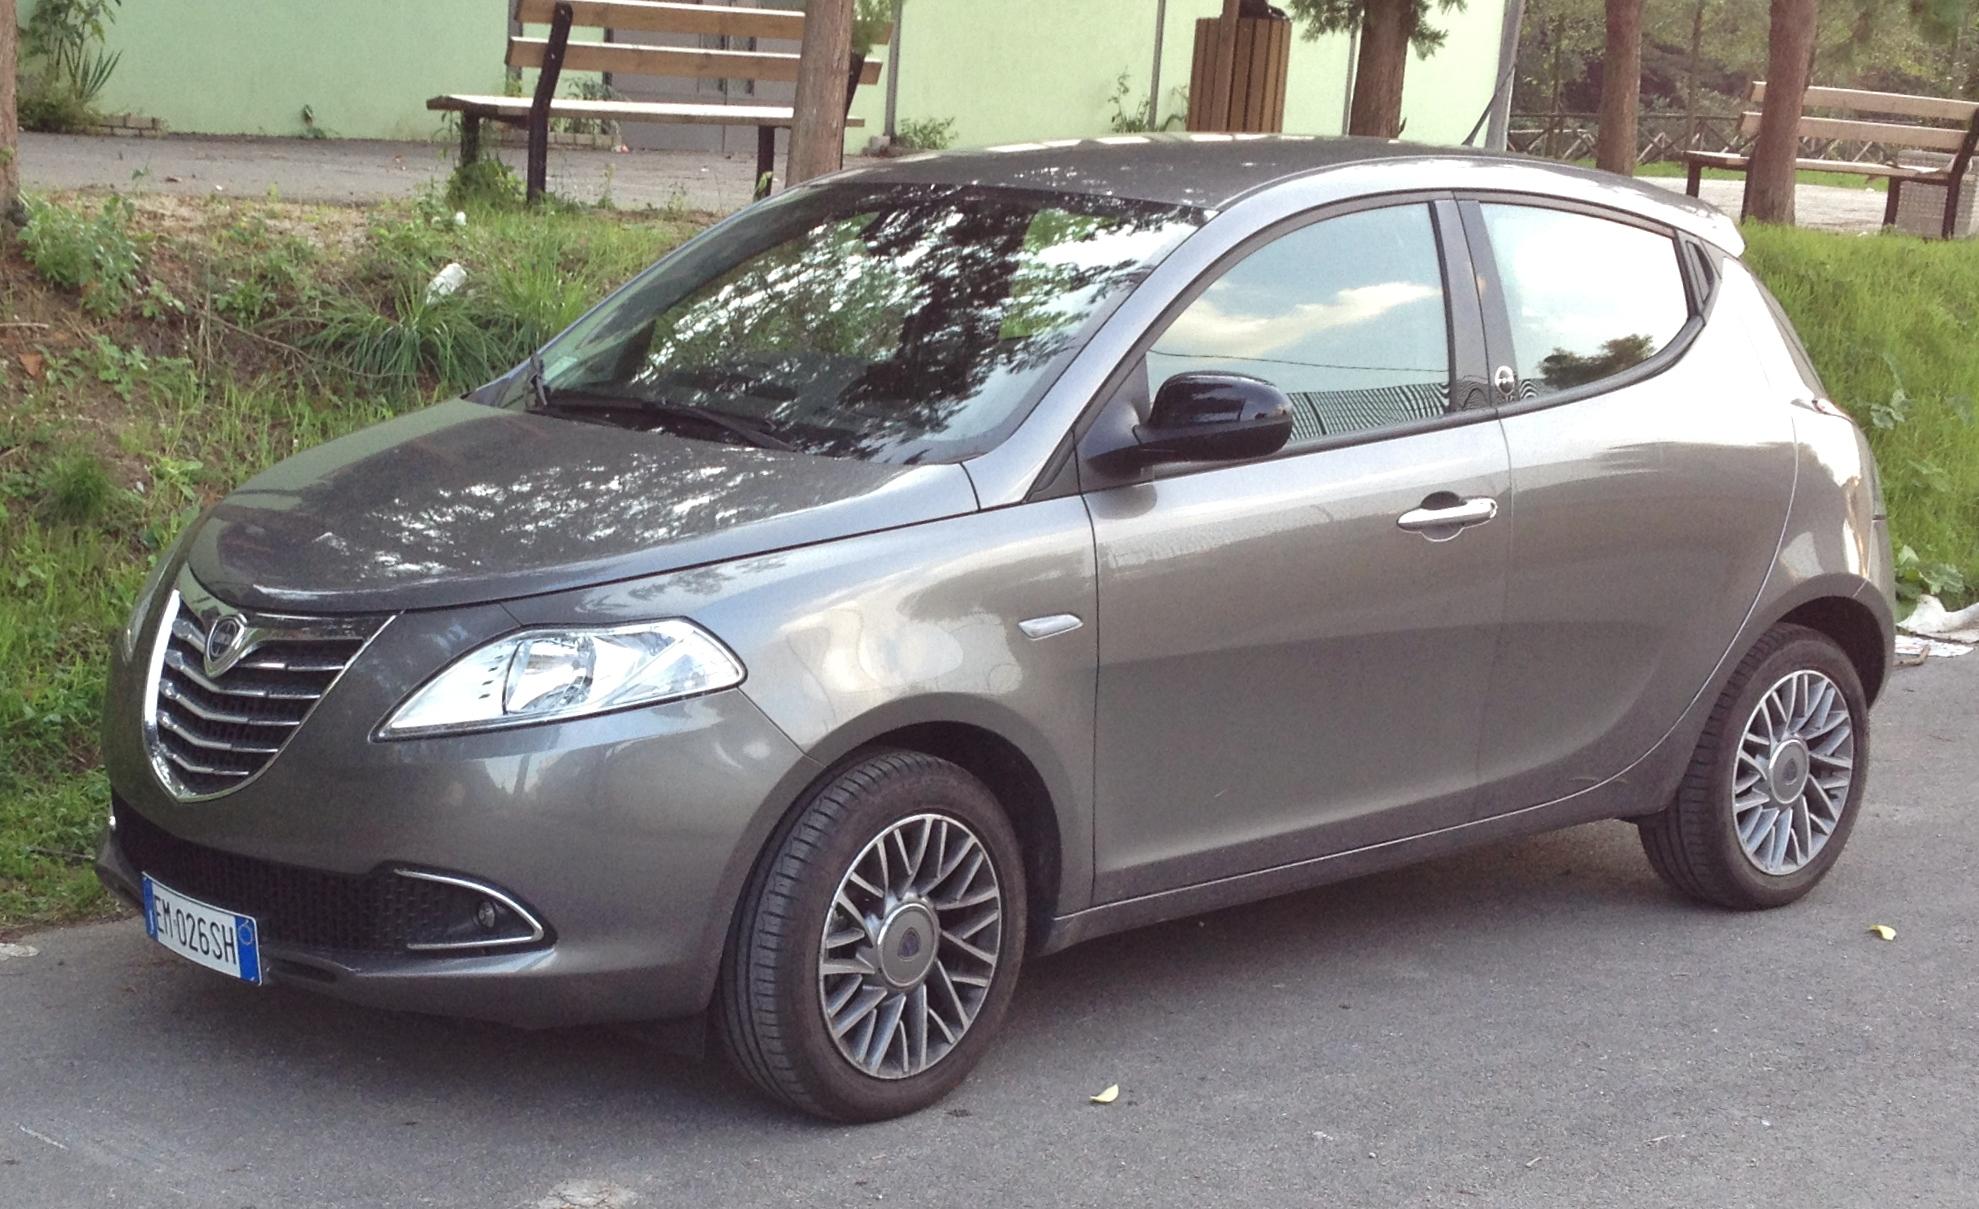 https://upload.wikimedia.org/wikipedia/commons/7/7d/2012_Lancia_Ypsilon_1.2_EcoChic.JPG